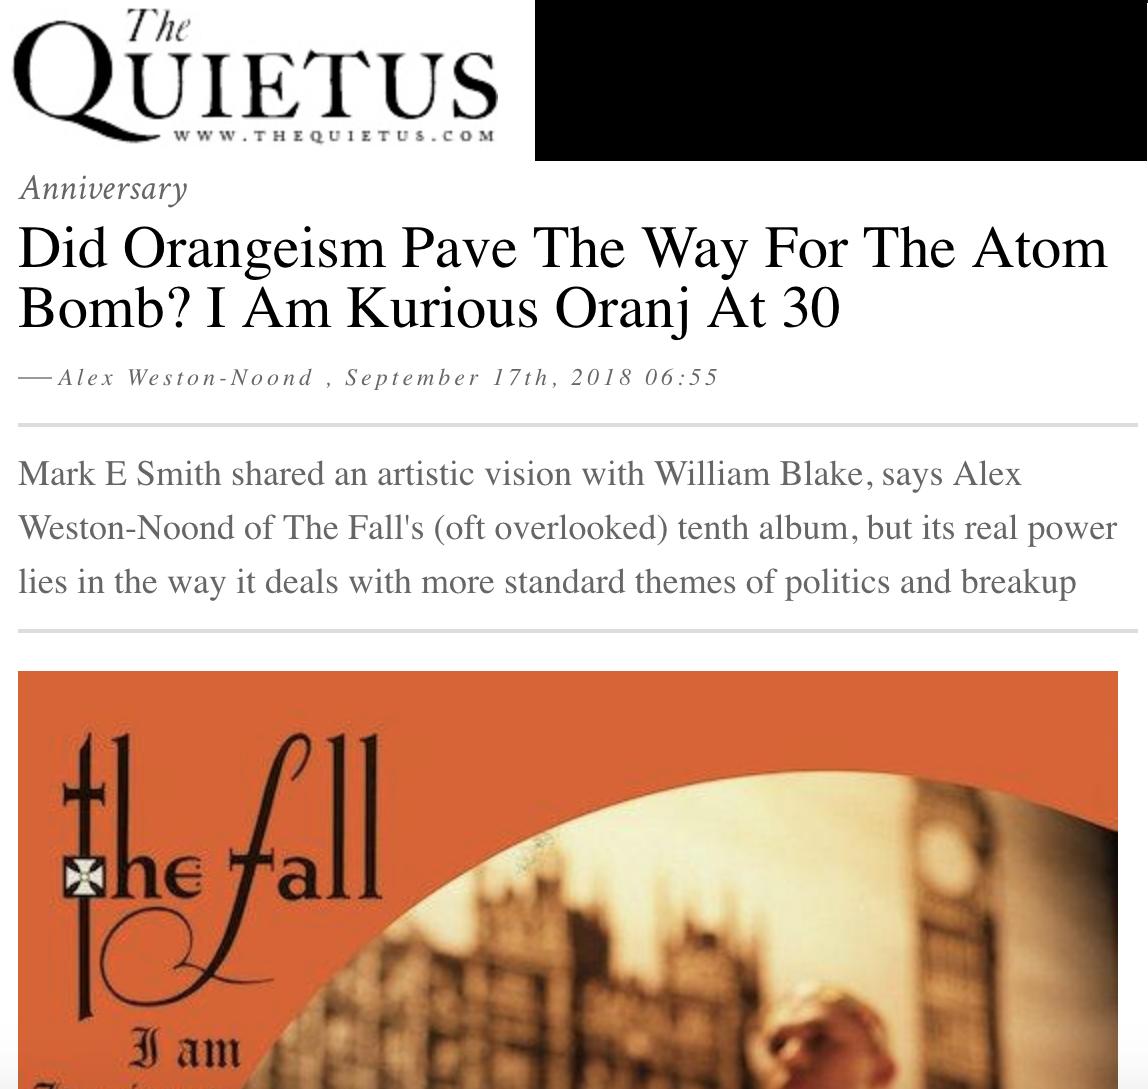 Did Orangeism Pave The Way For The Atom Bomb? I Am Kurious Oranj At 30